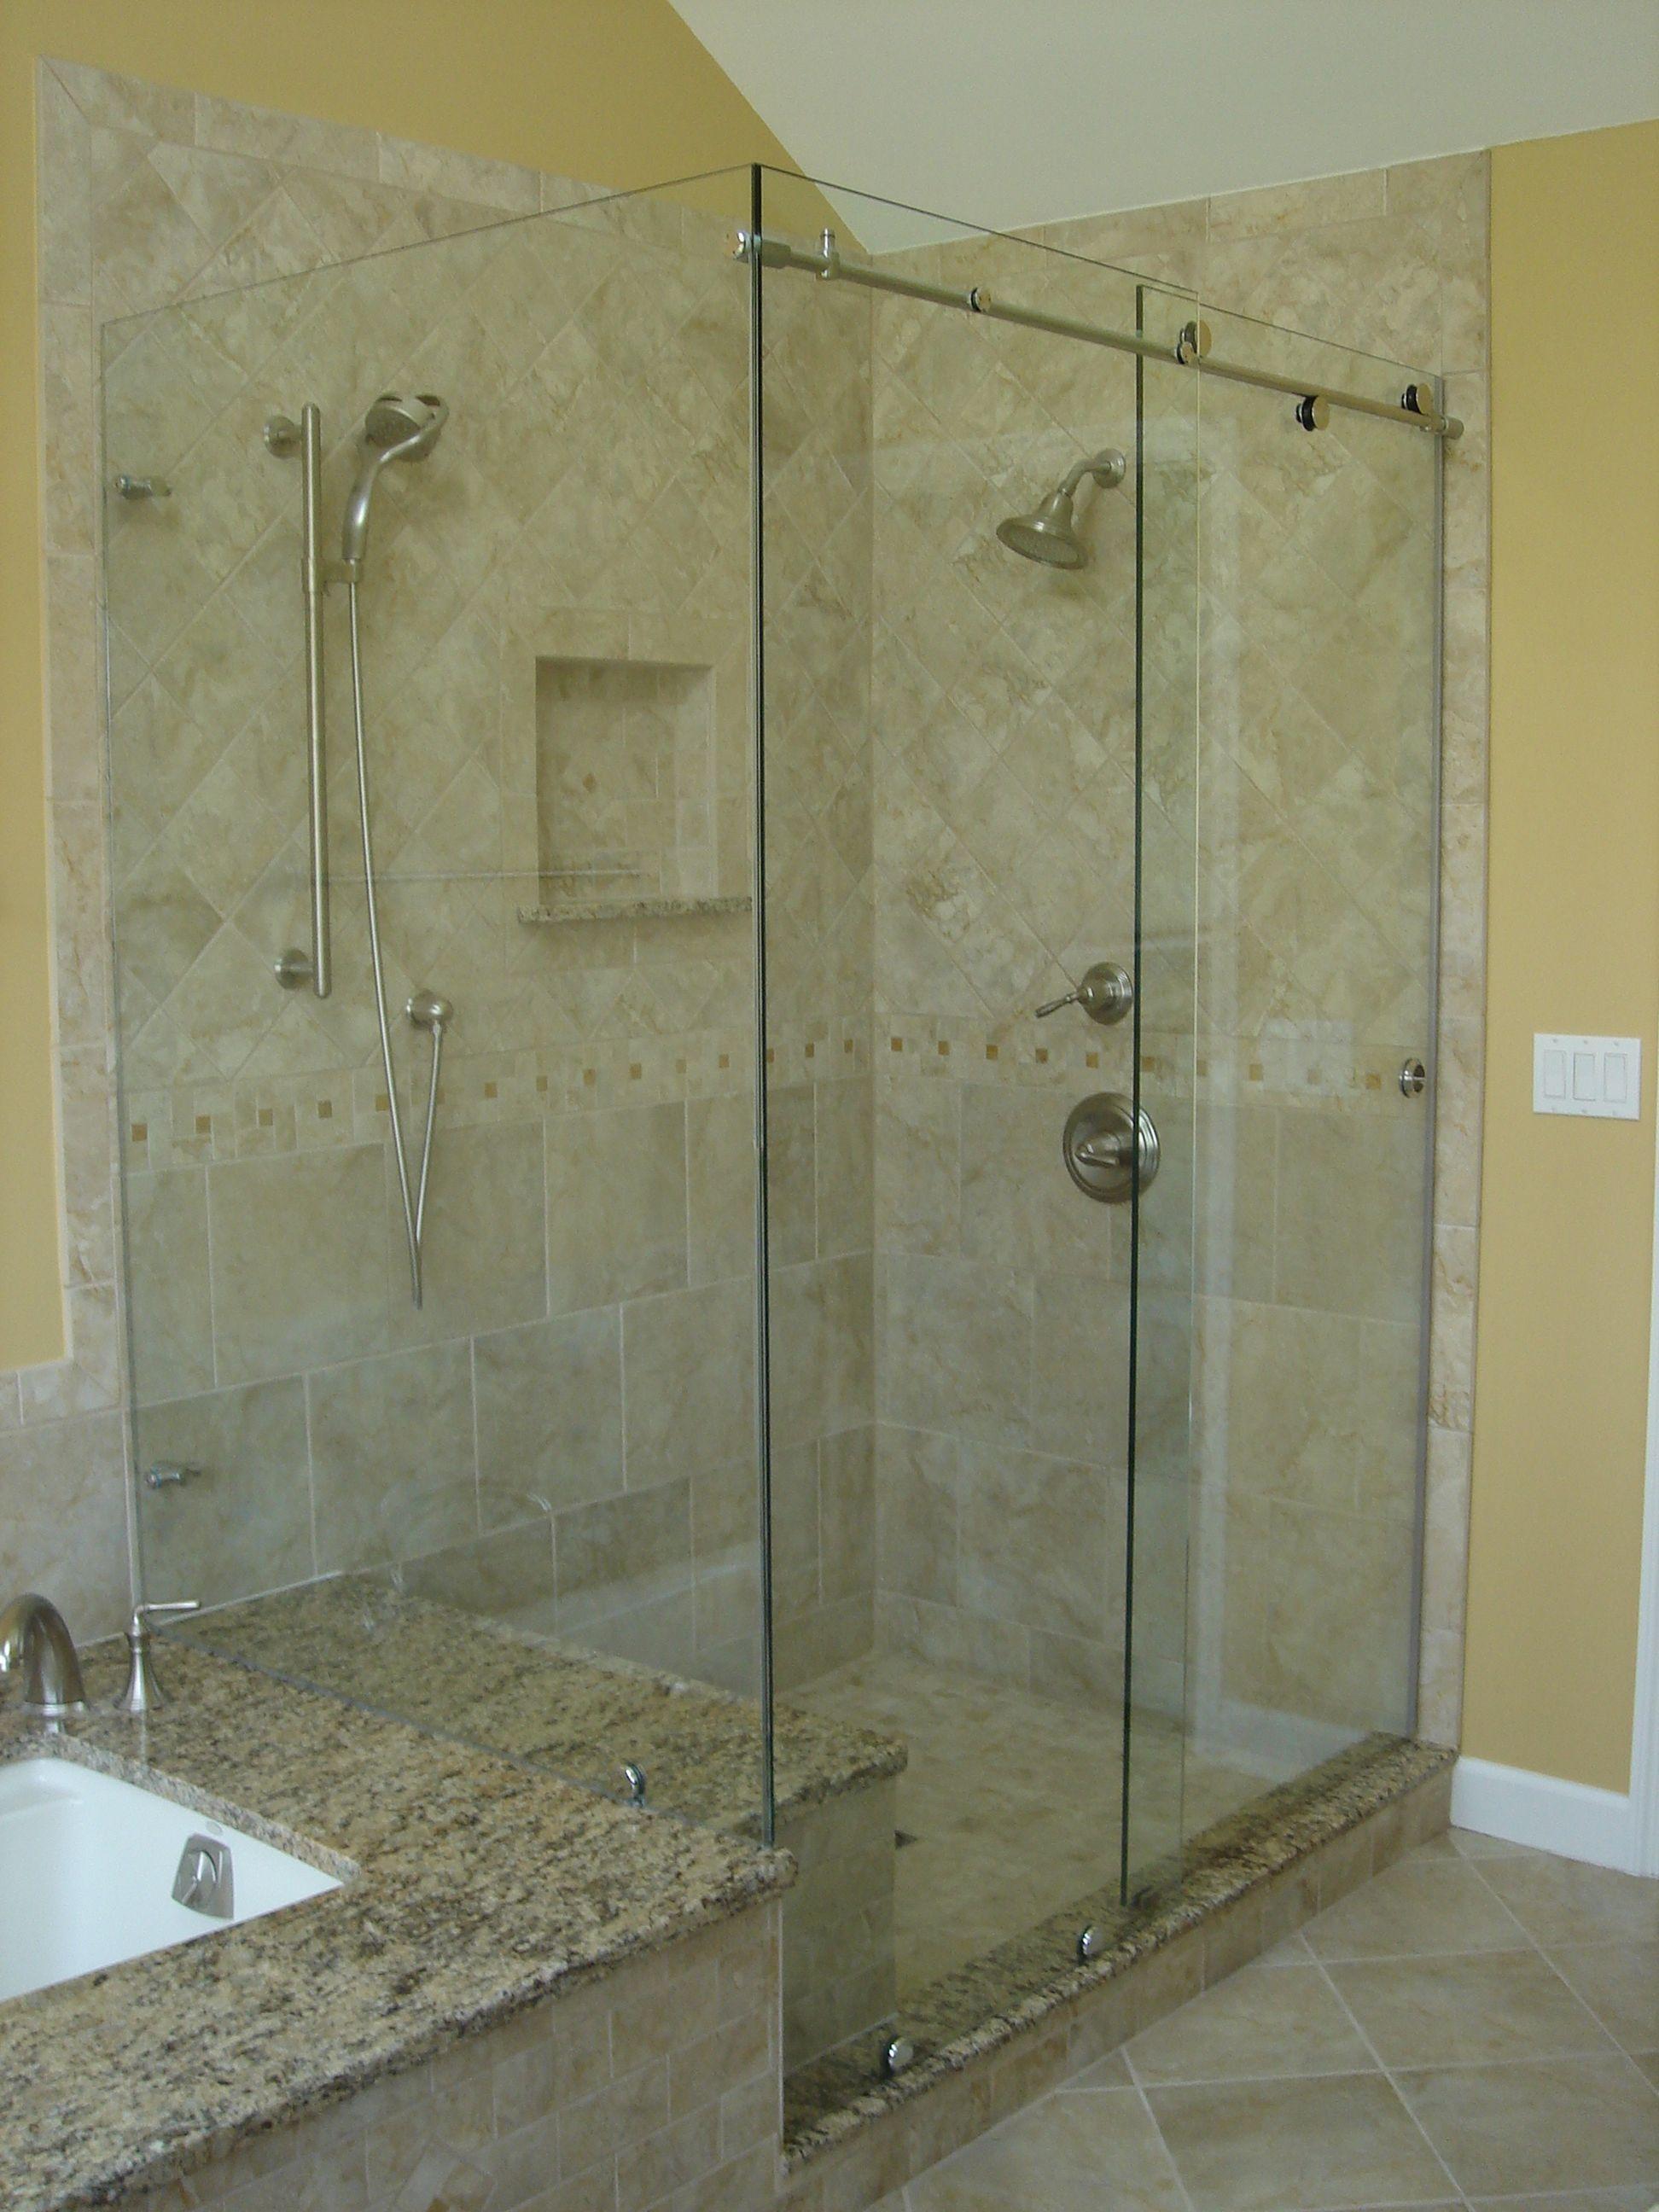 Phenomenal 23 Most Popular Bathroom Sliding Shower Door For Amazing Bathroom Design Https Dec Frameless Sliding Shower Doors Sliding Shower Door Glass Shower